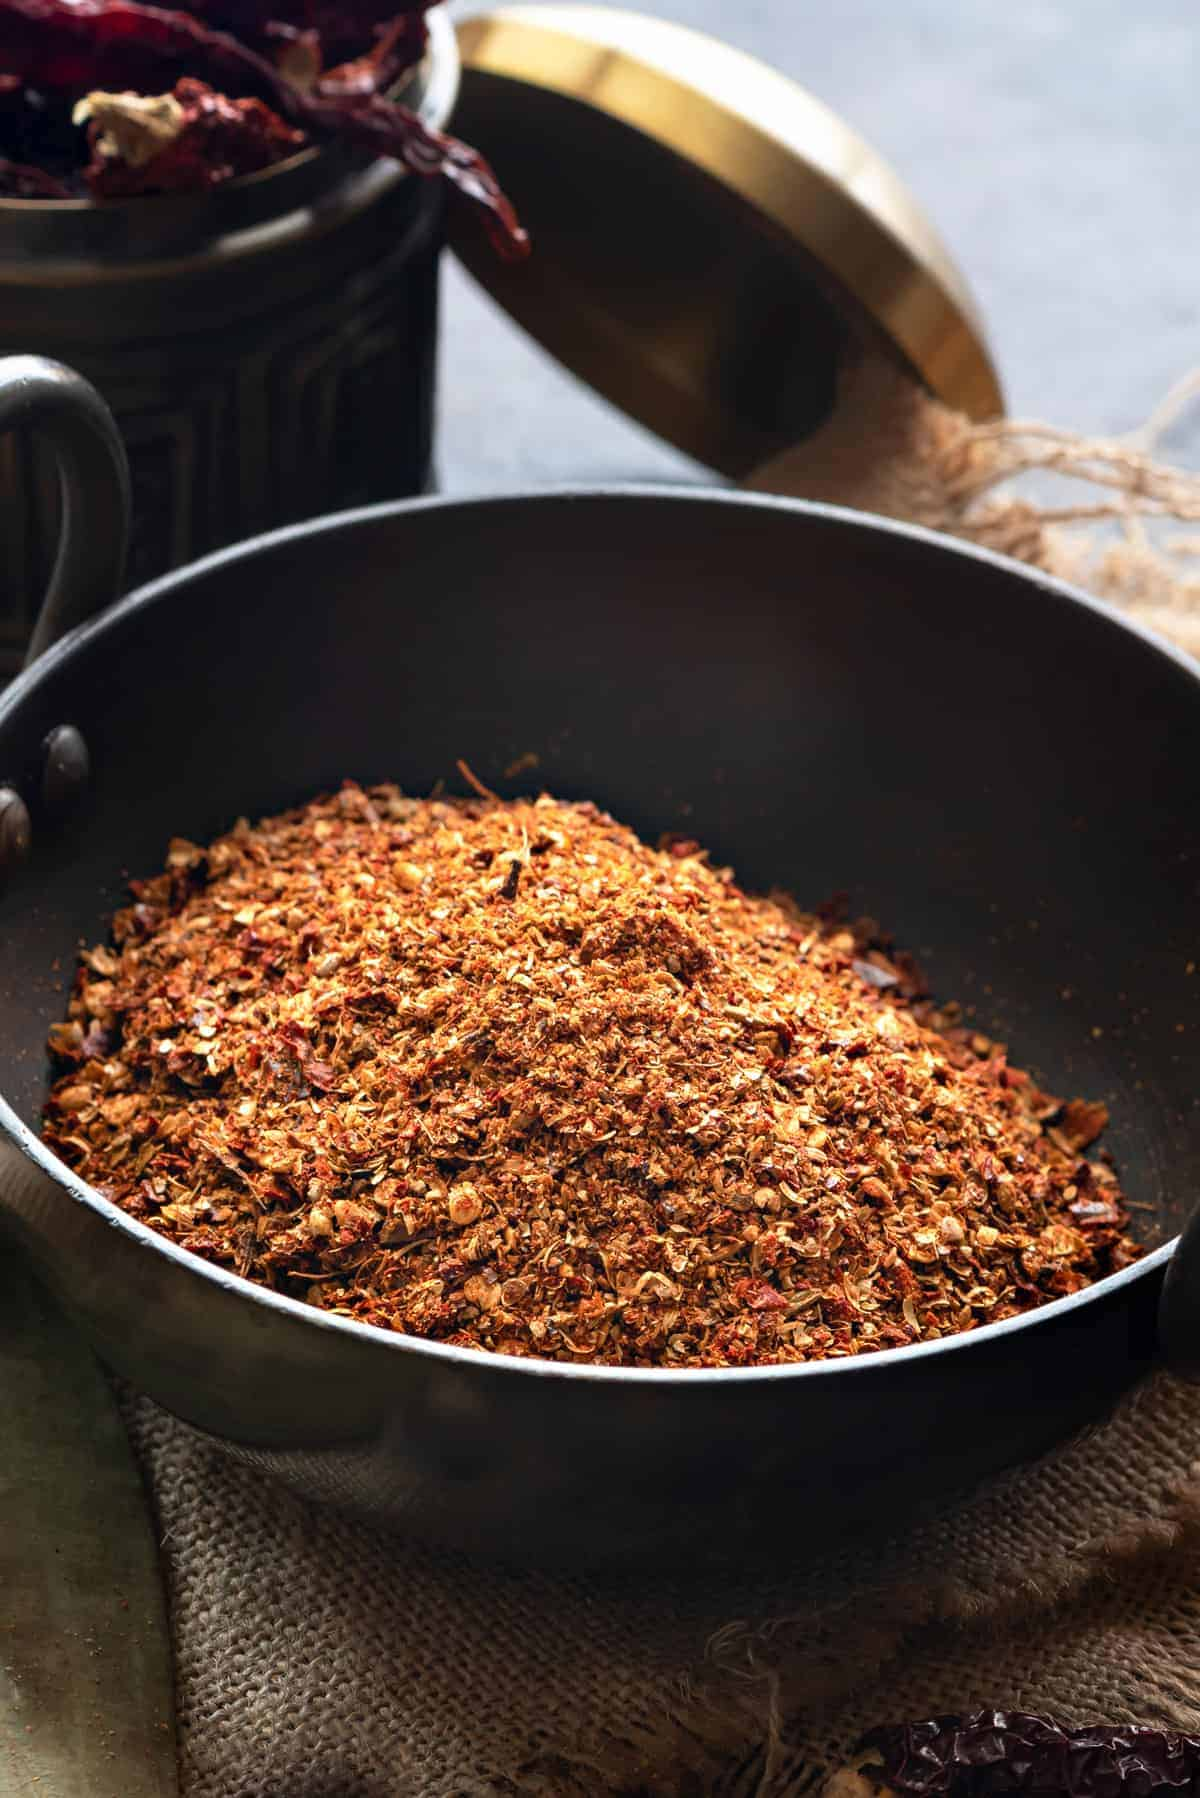 Close up shot of kadai masala powder in Indian wok.